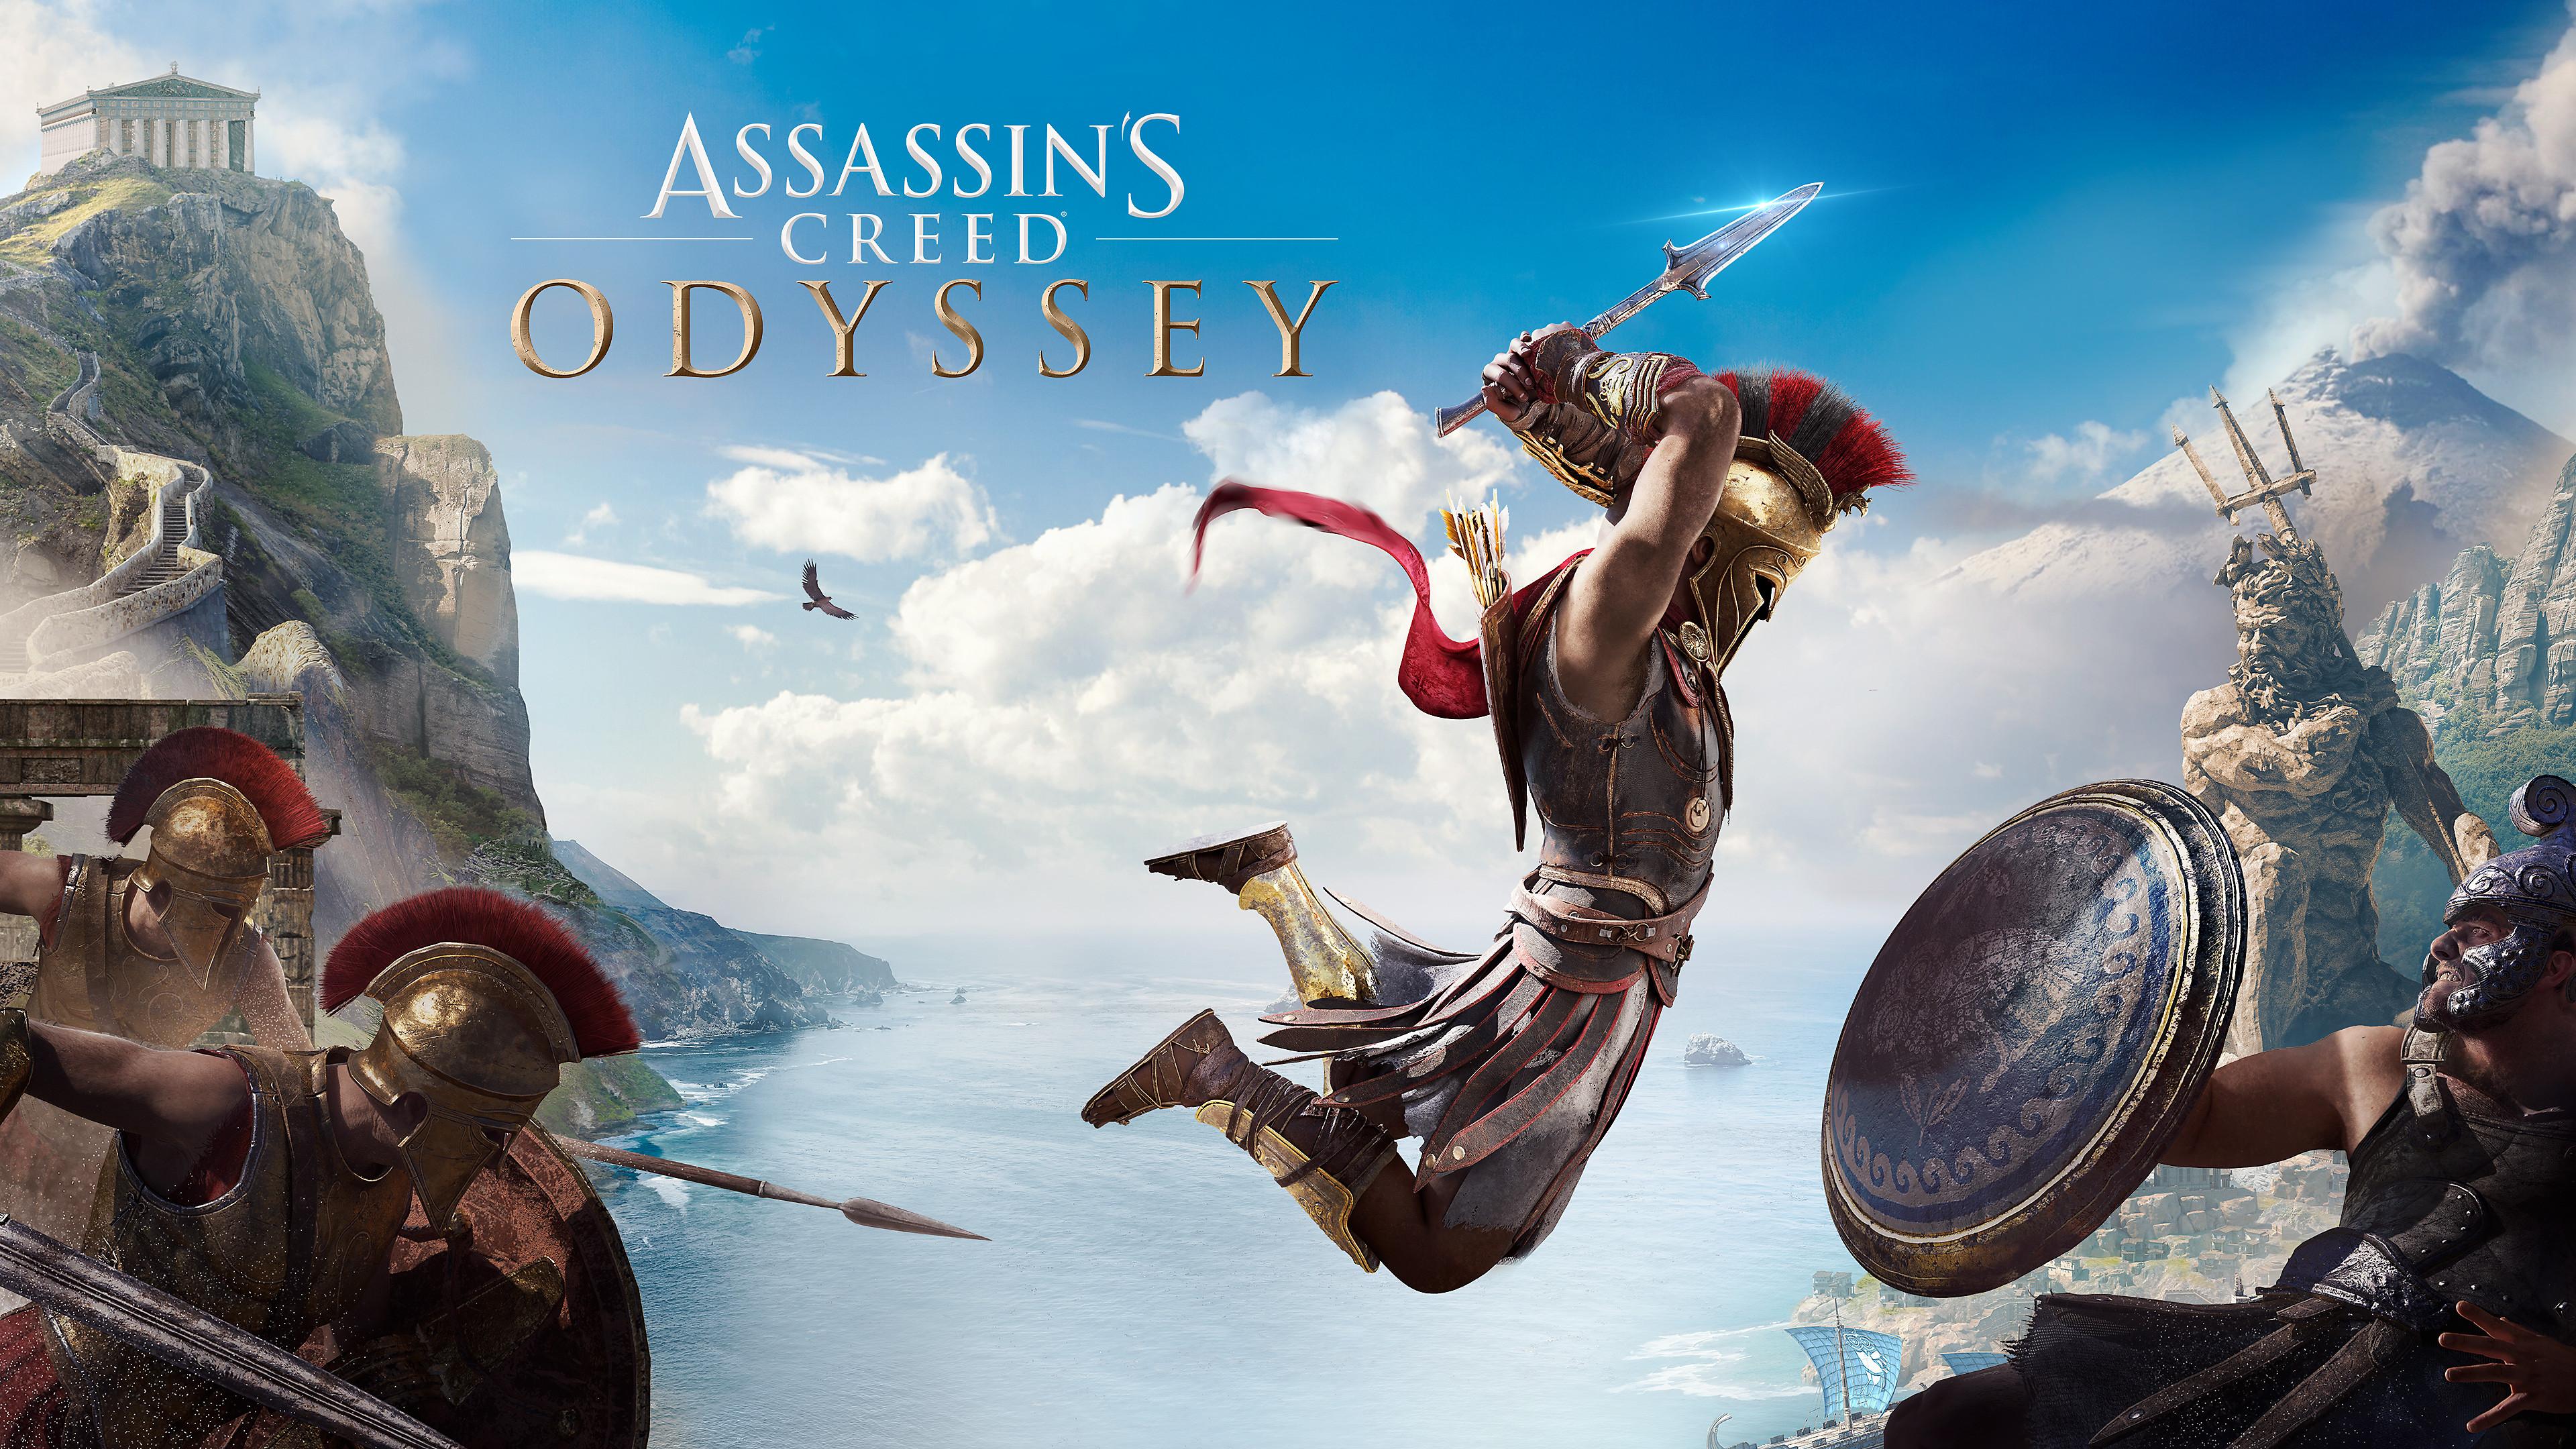 assassins creed odyssey wallpaper hd 1920x1080